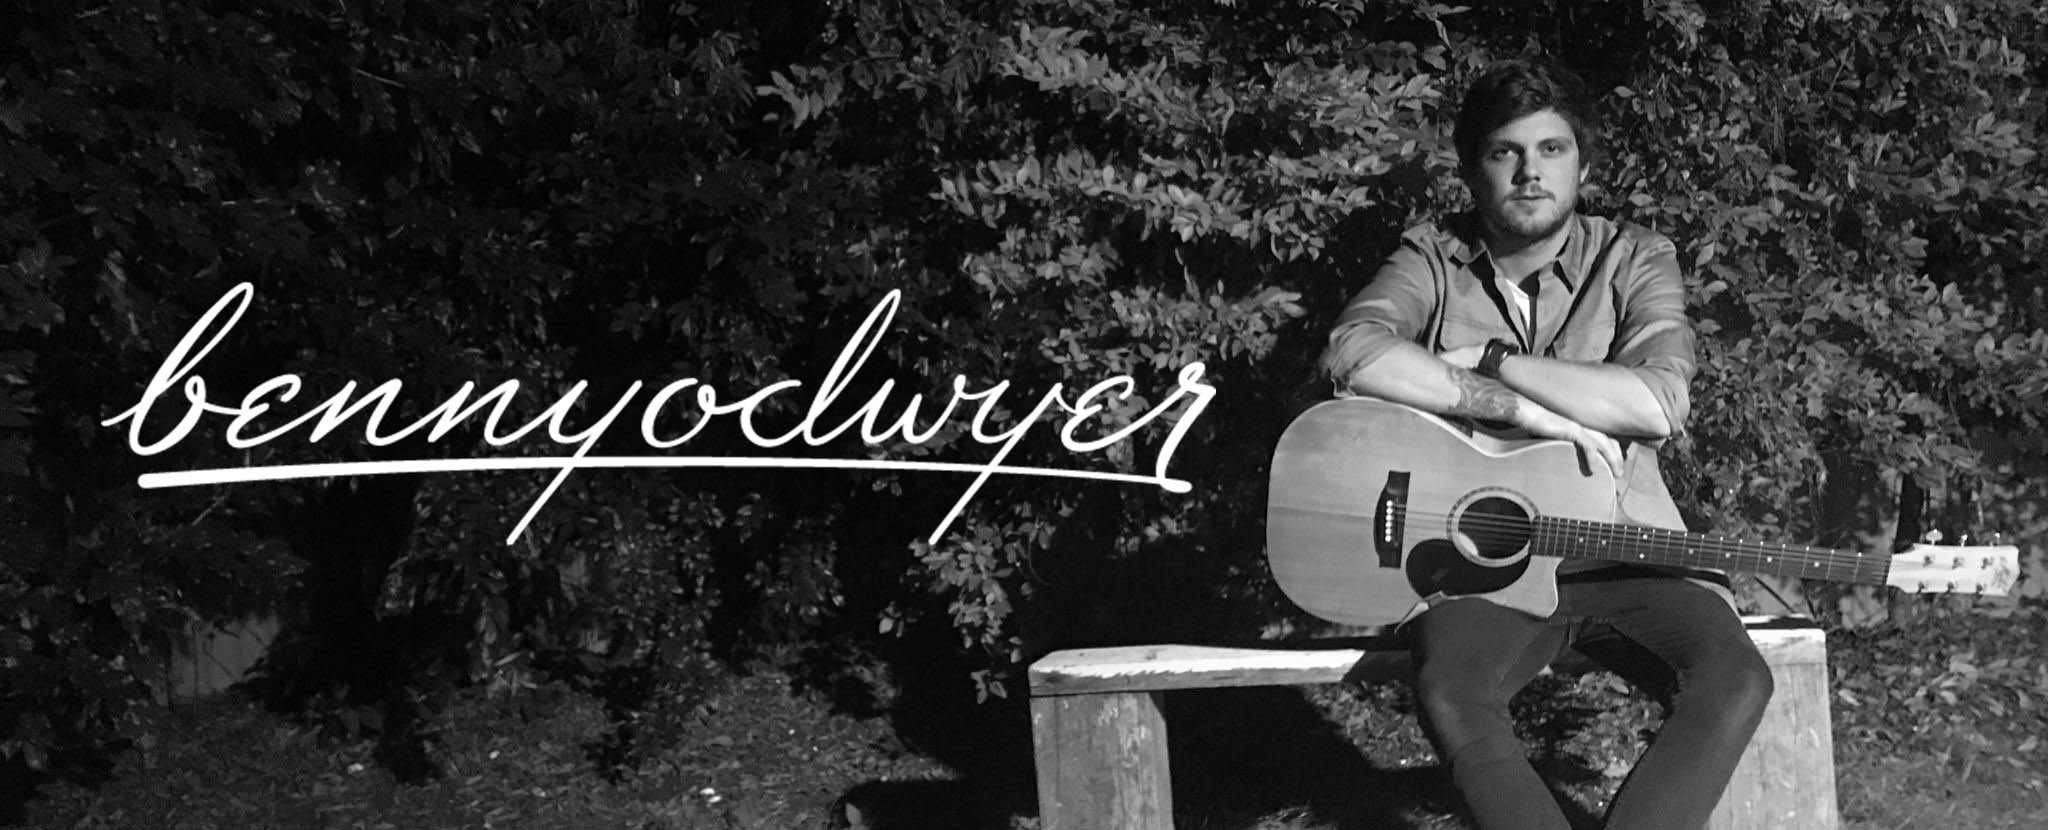 pete-adams-design-logotype-musician-BennyODwyer_Banner-Guitar-SetUp-web.jpg